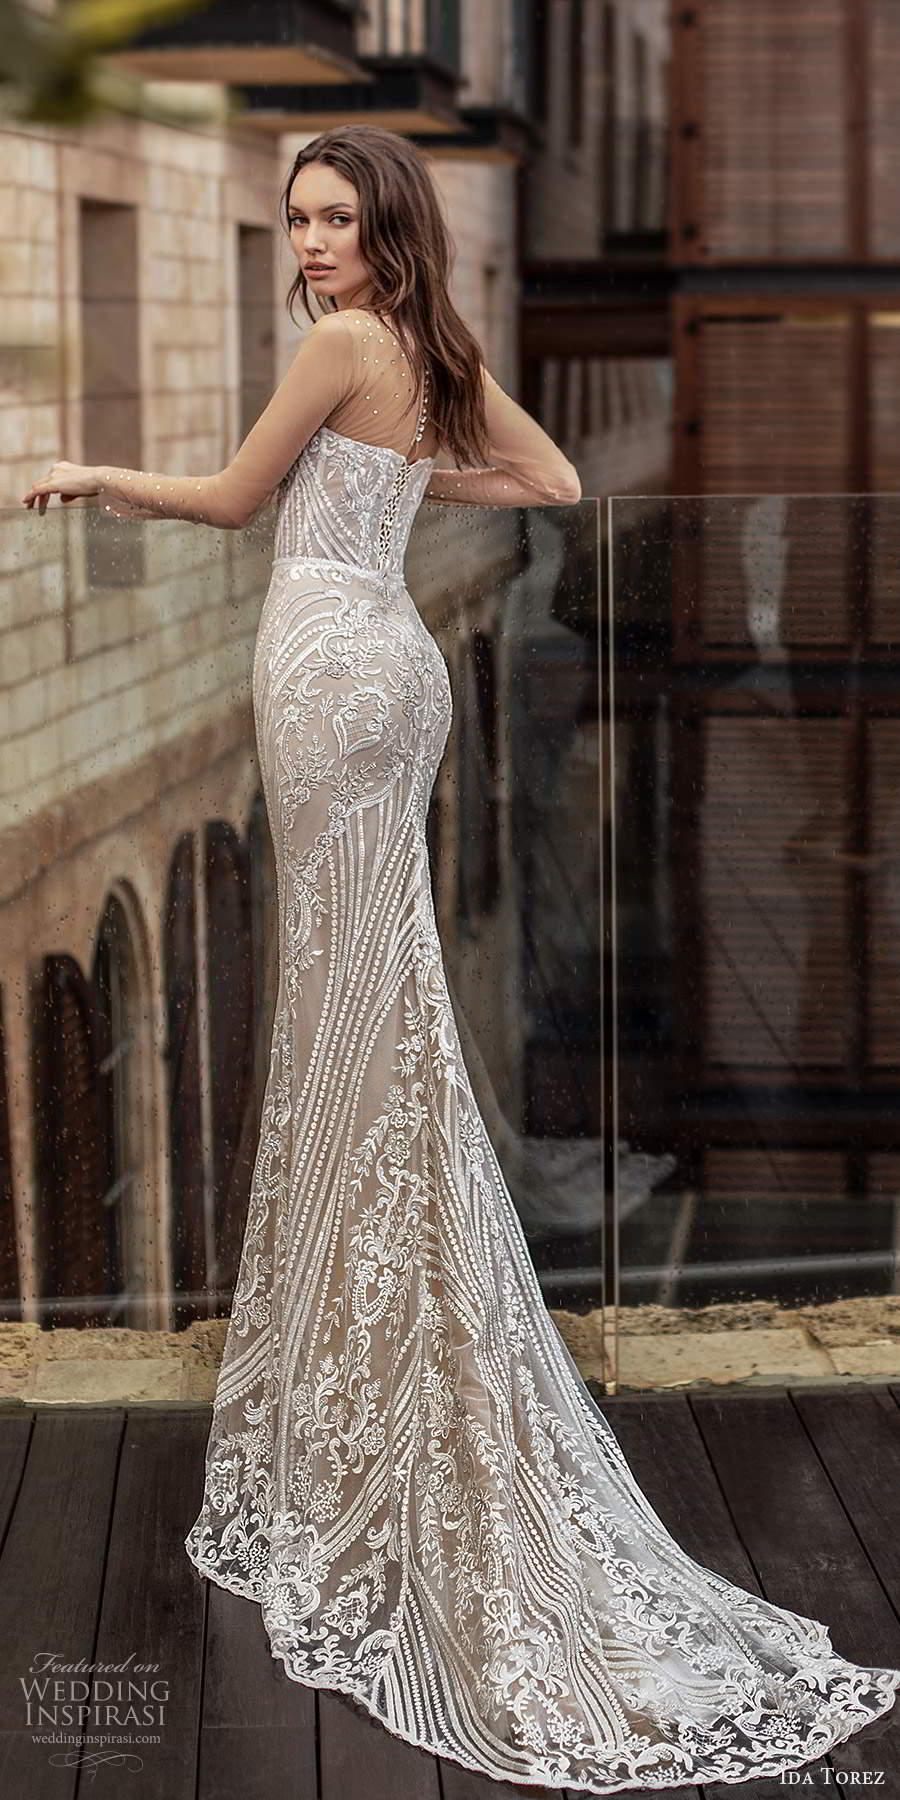 ida torez 2021 bridal illusion long sleeves sheer jewel sweetheart neckline fully embellished lace sheath wedding dress chapel train (14) bv